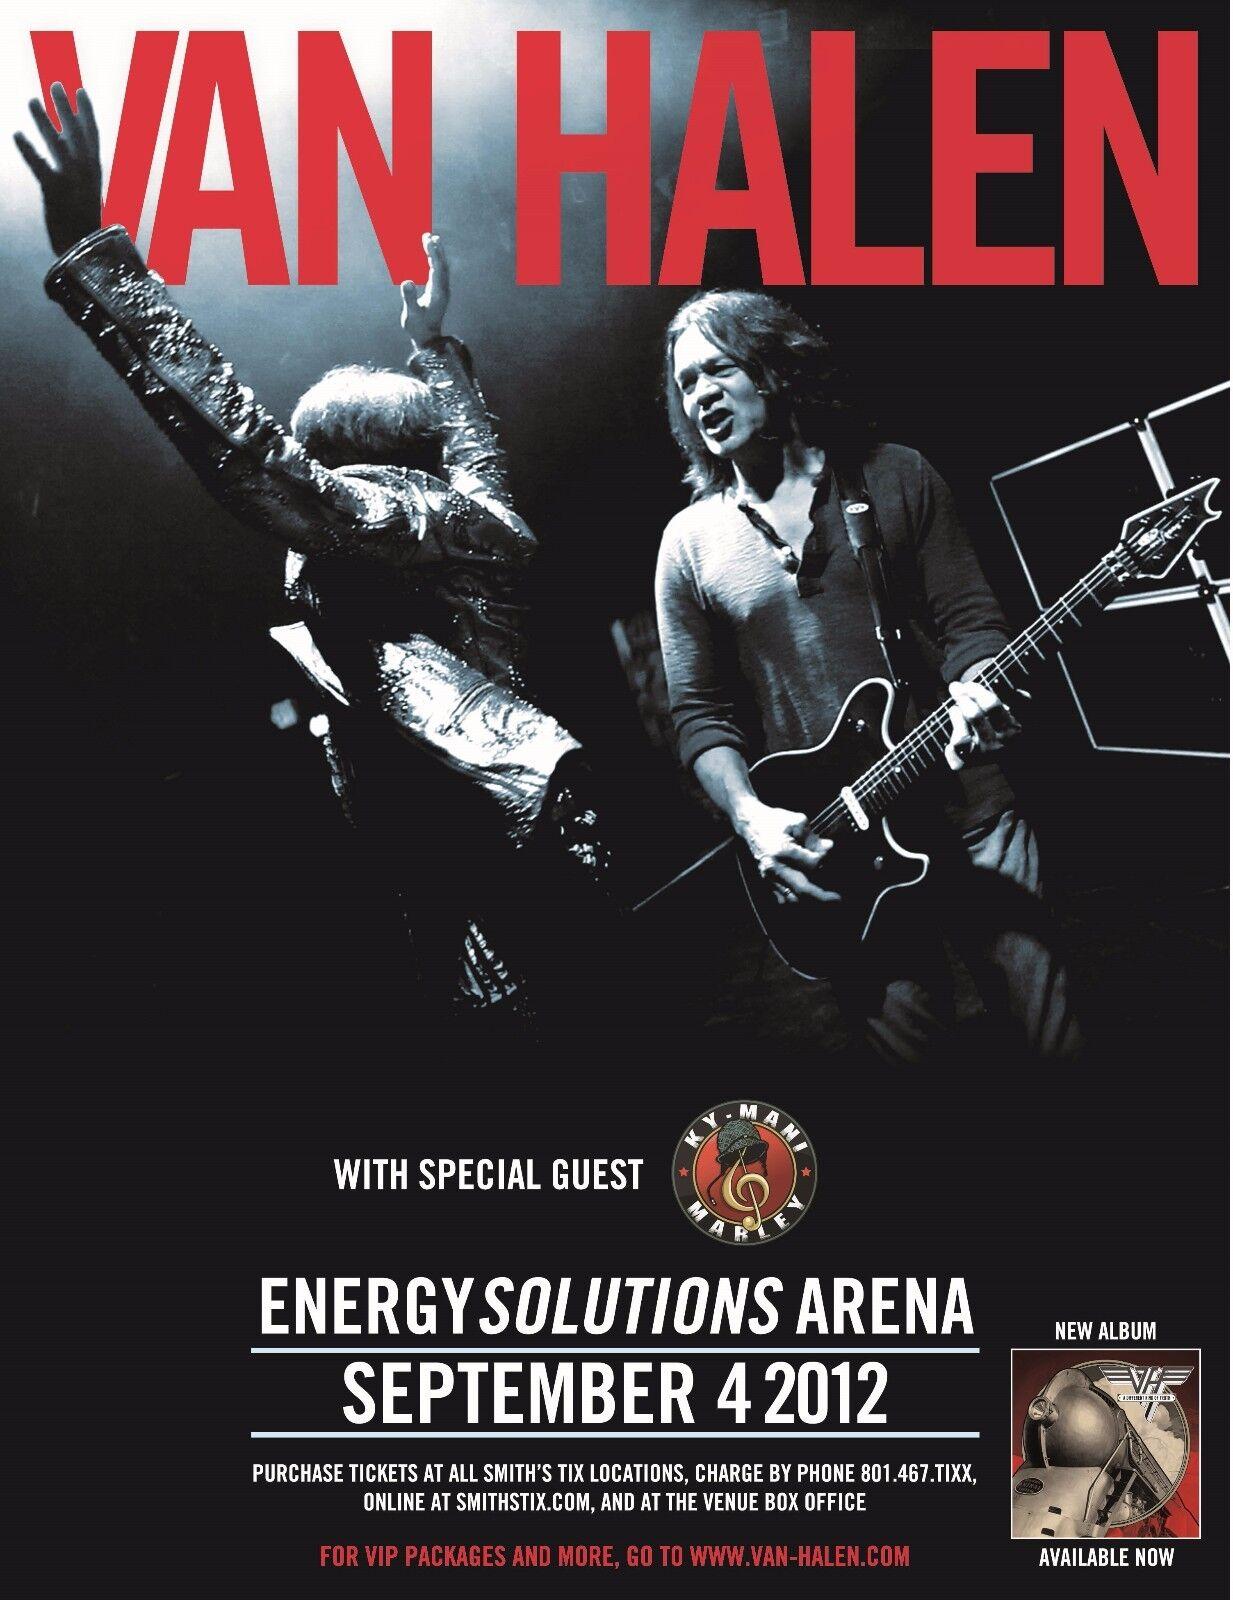 van halen 2012 salt lake concert tour poster eddie jamming with david lee roth